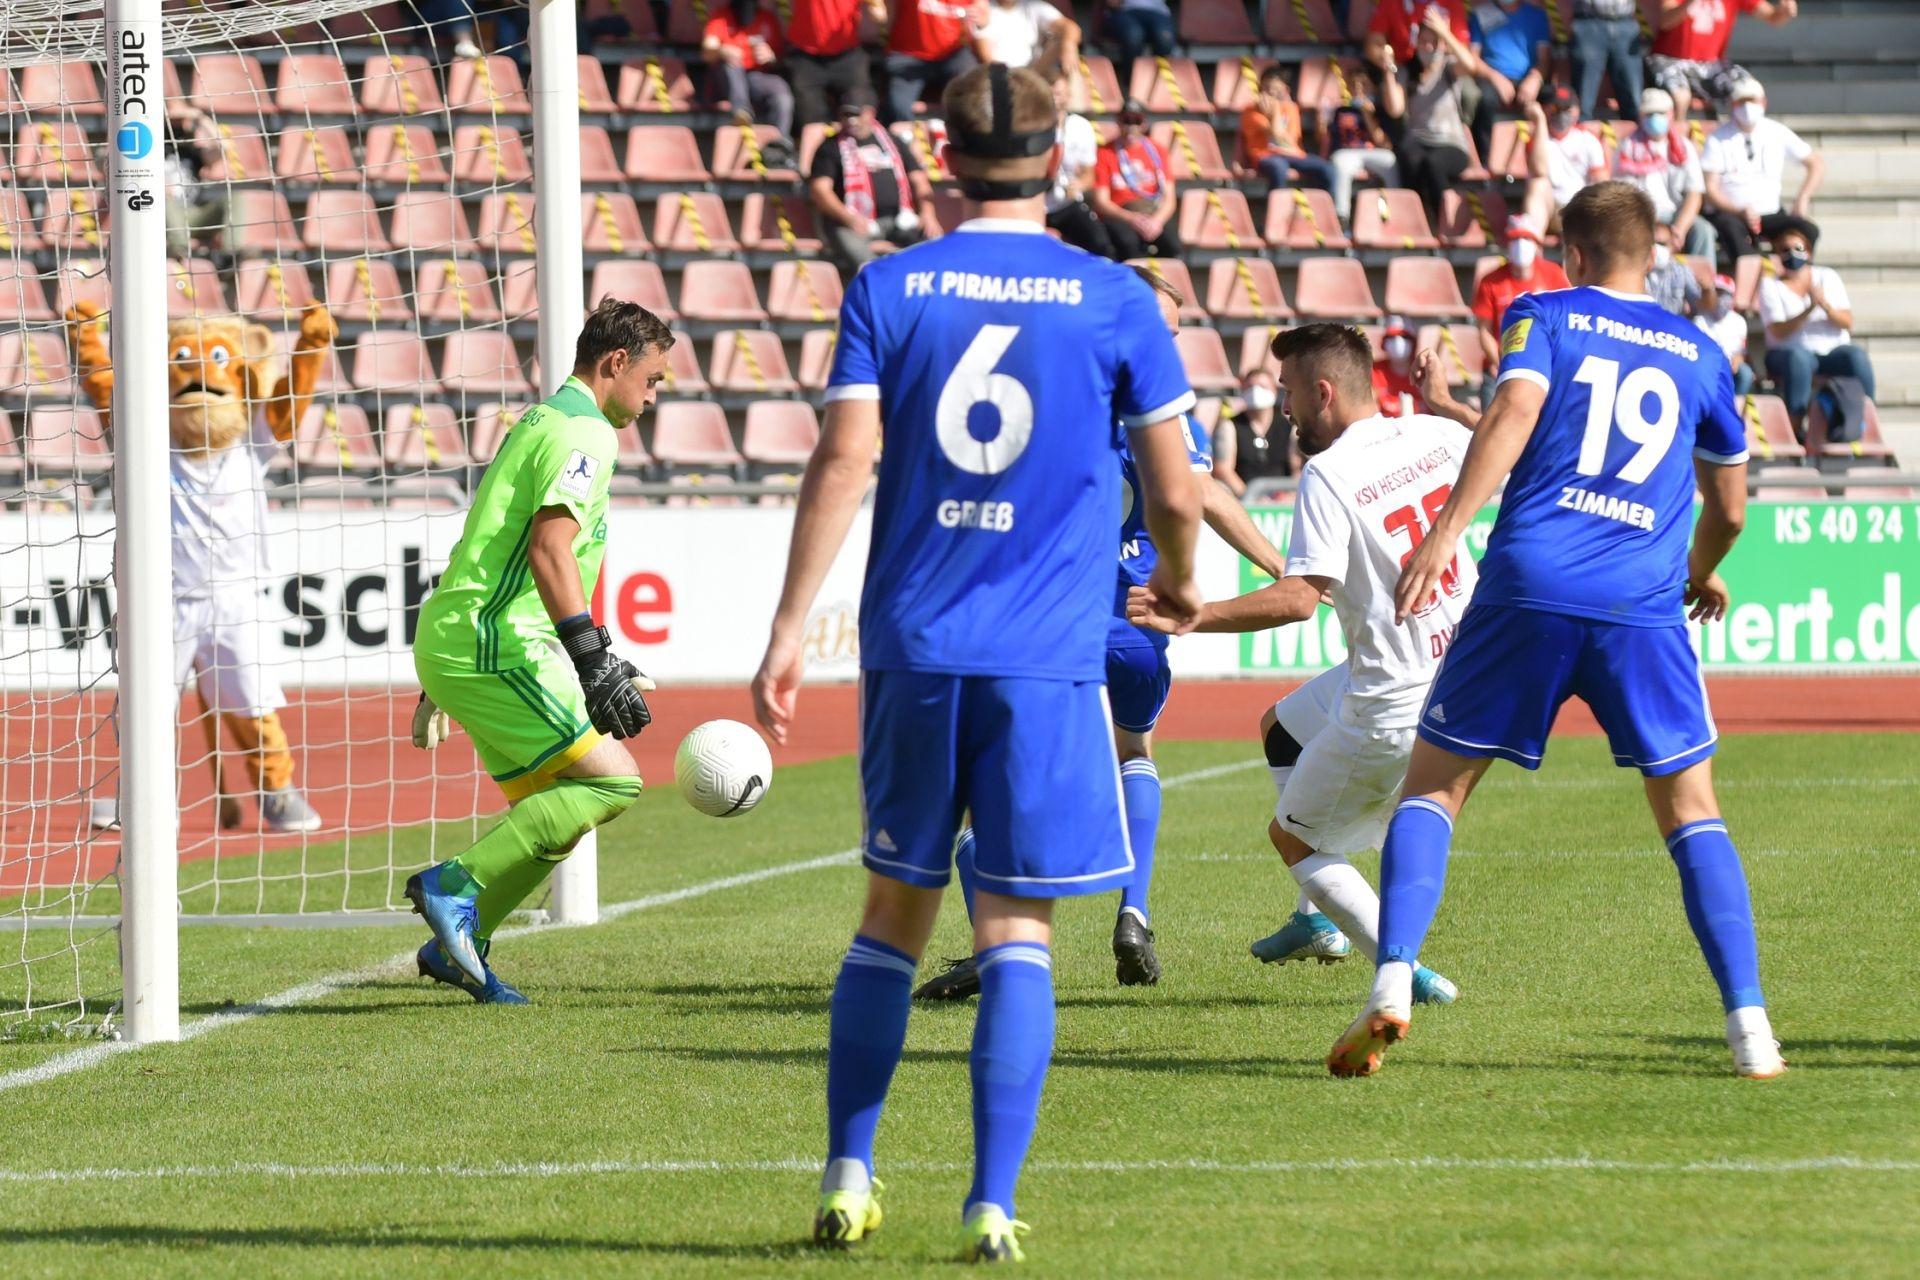 Regionalliga S�dwest 2020/21, KSV Hessen Kassel, FK 03 Pirmasens, Endstand 1:1, Torschuss zum 1:1